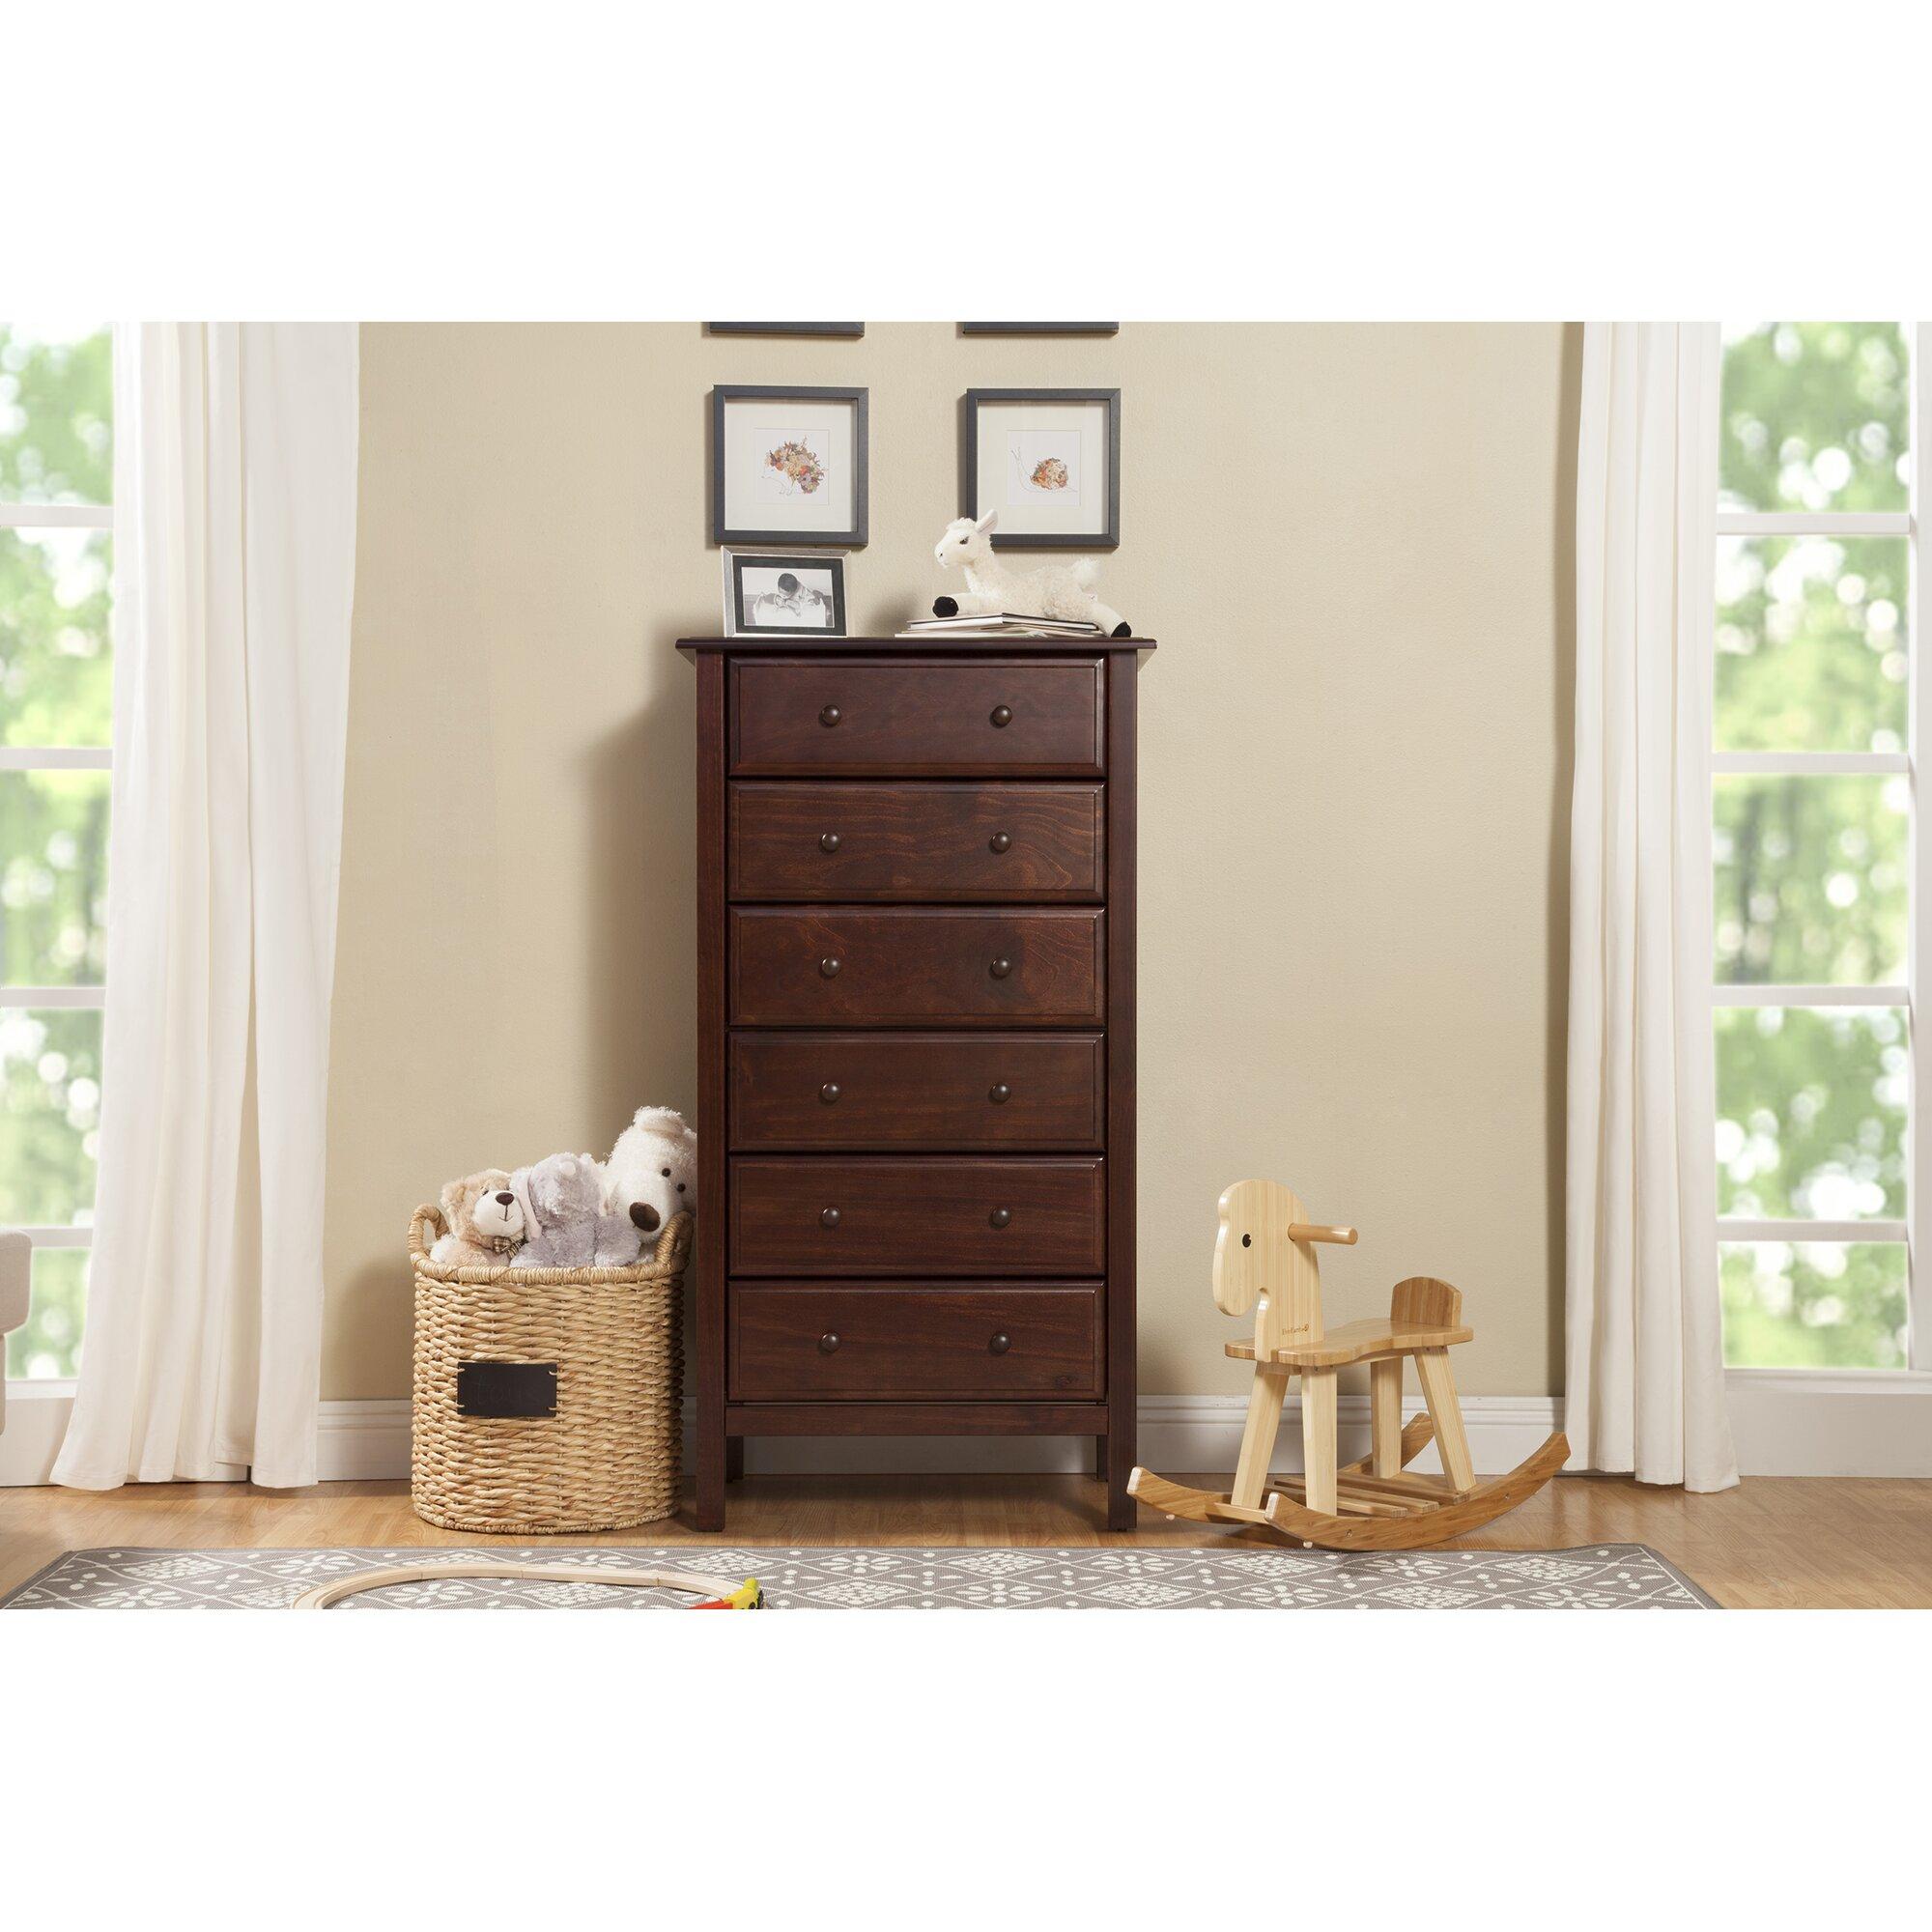 DaVinci Jayden 6 Drawer Tall Dresser. DaVinci Jayden 6 Drawer Tall Dresser   Reviews   Wayfair